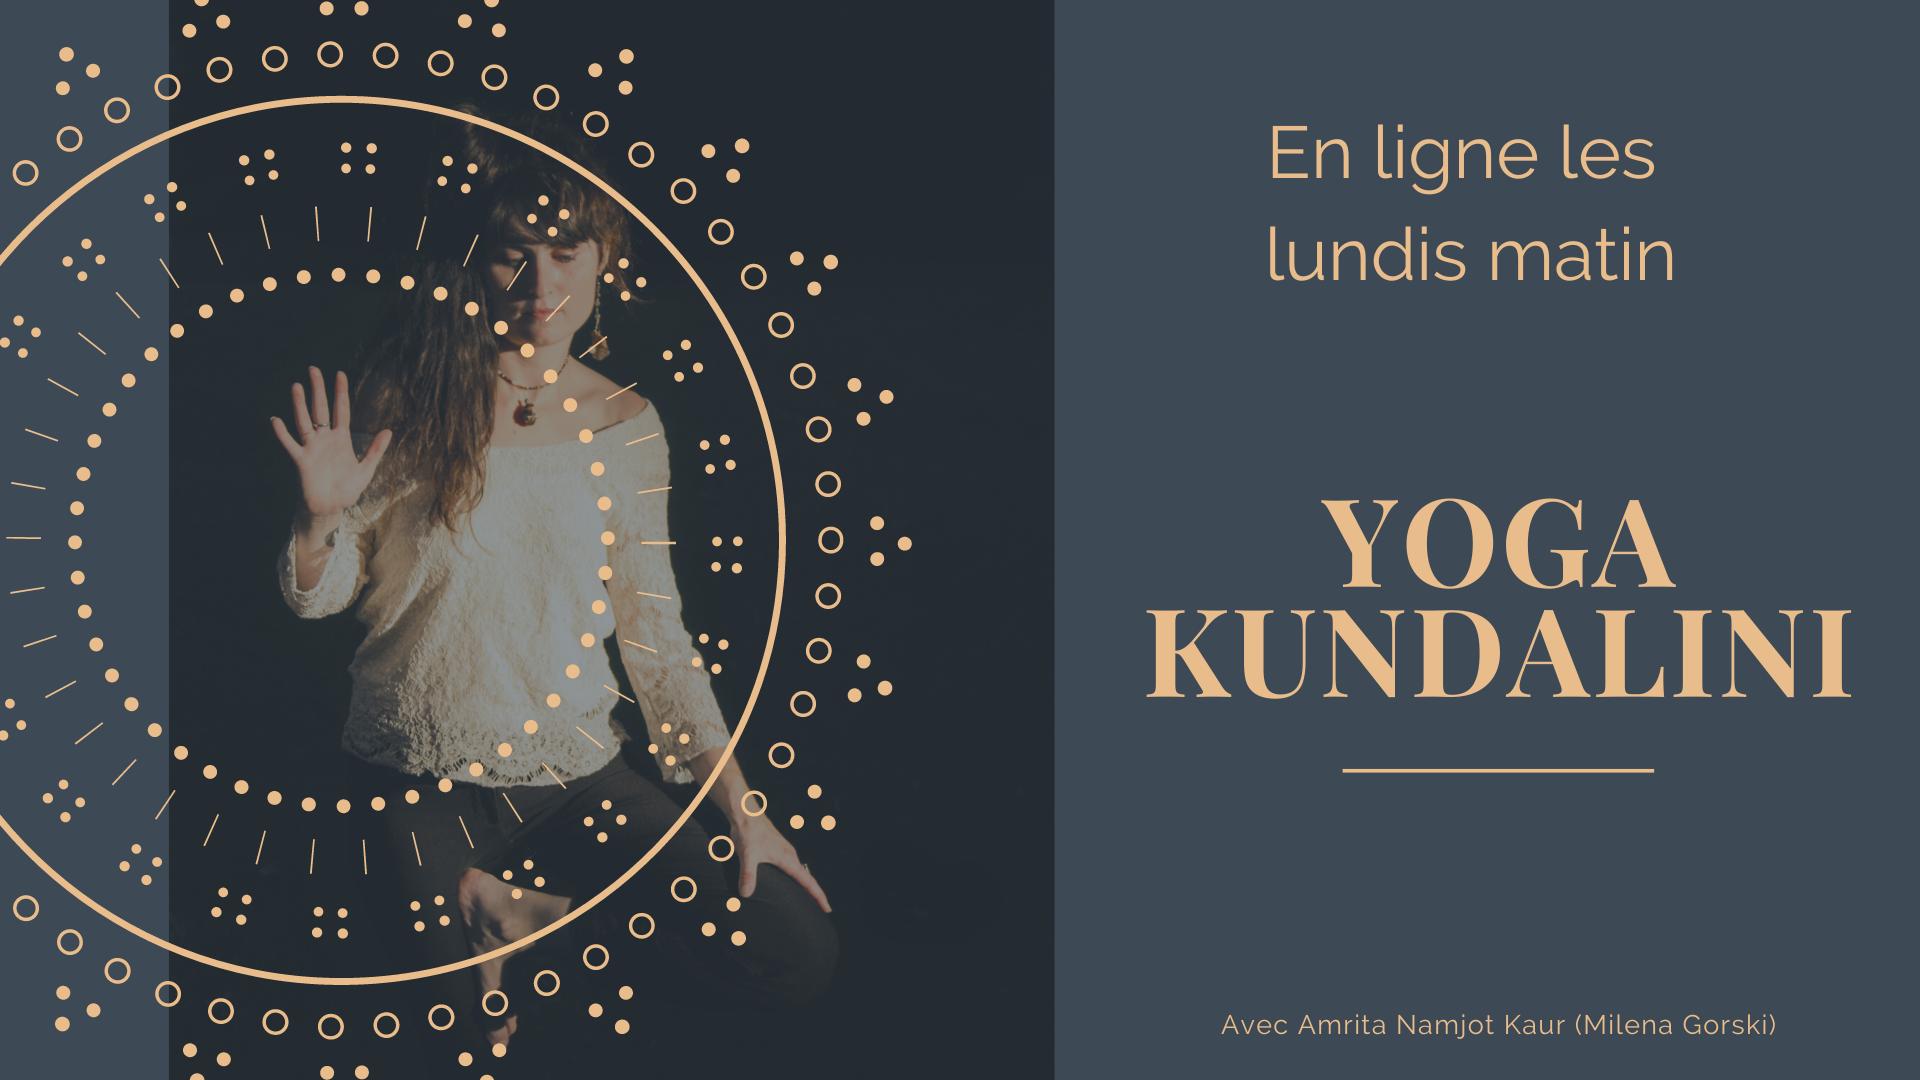 Yoga Kundalini en ligne